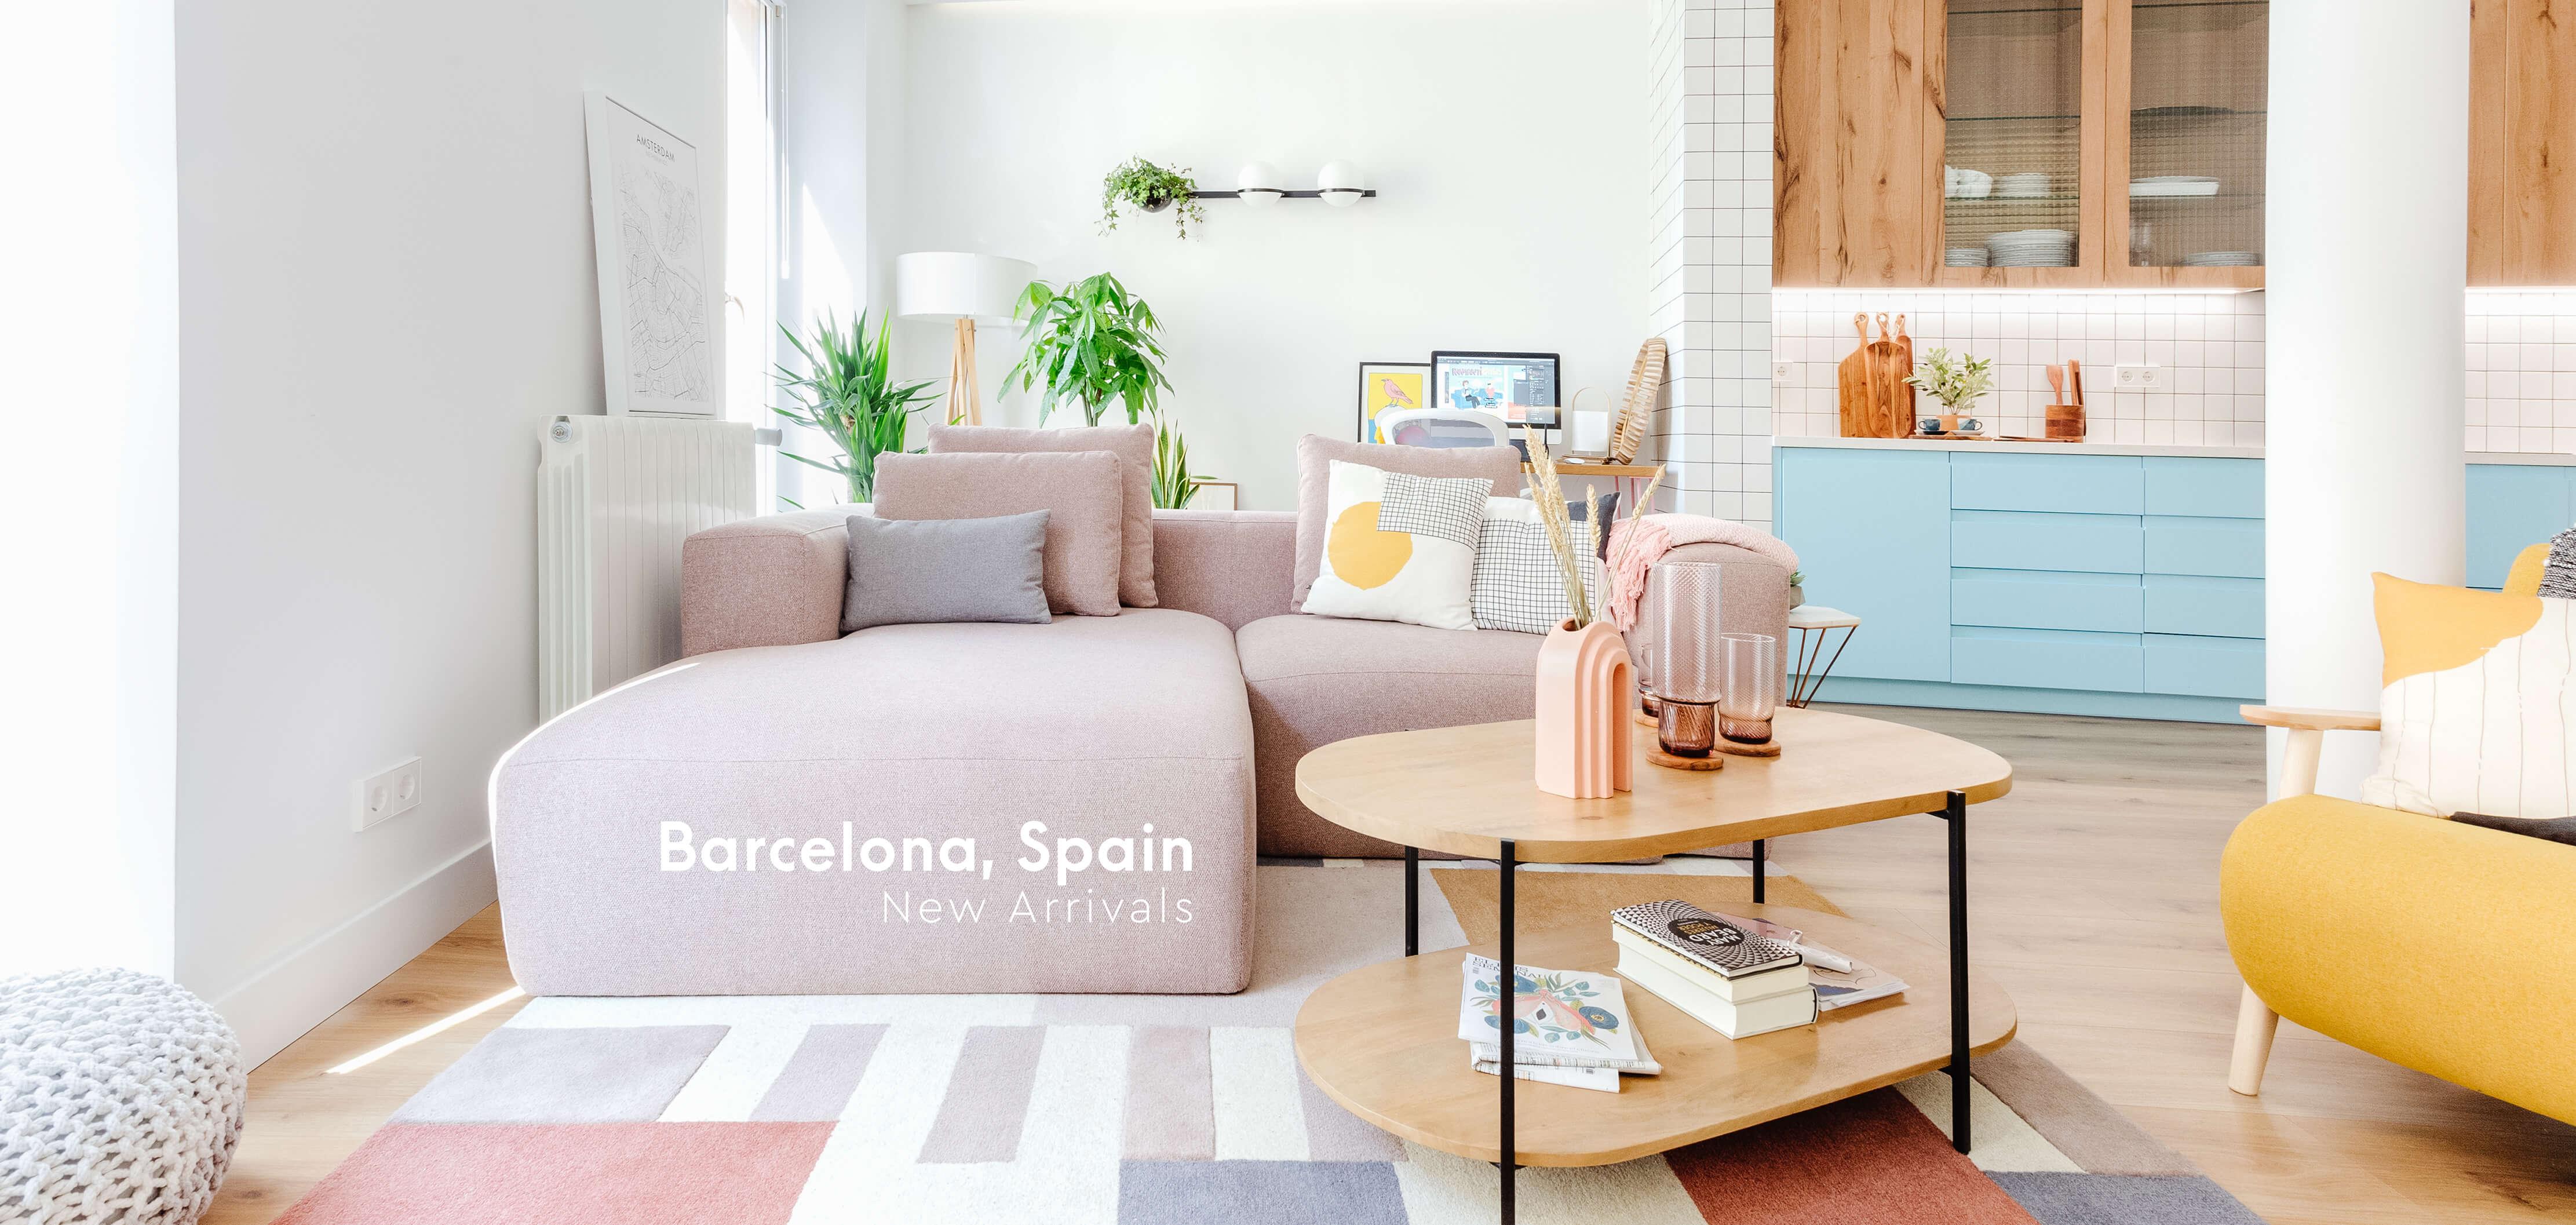 Barcelona Spain 01